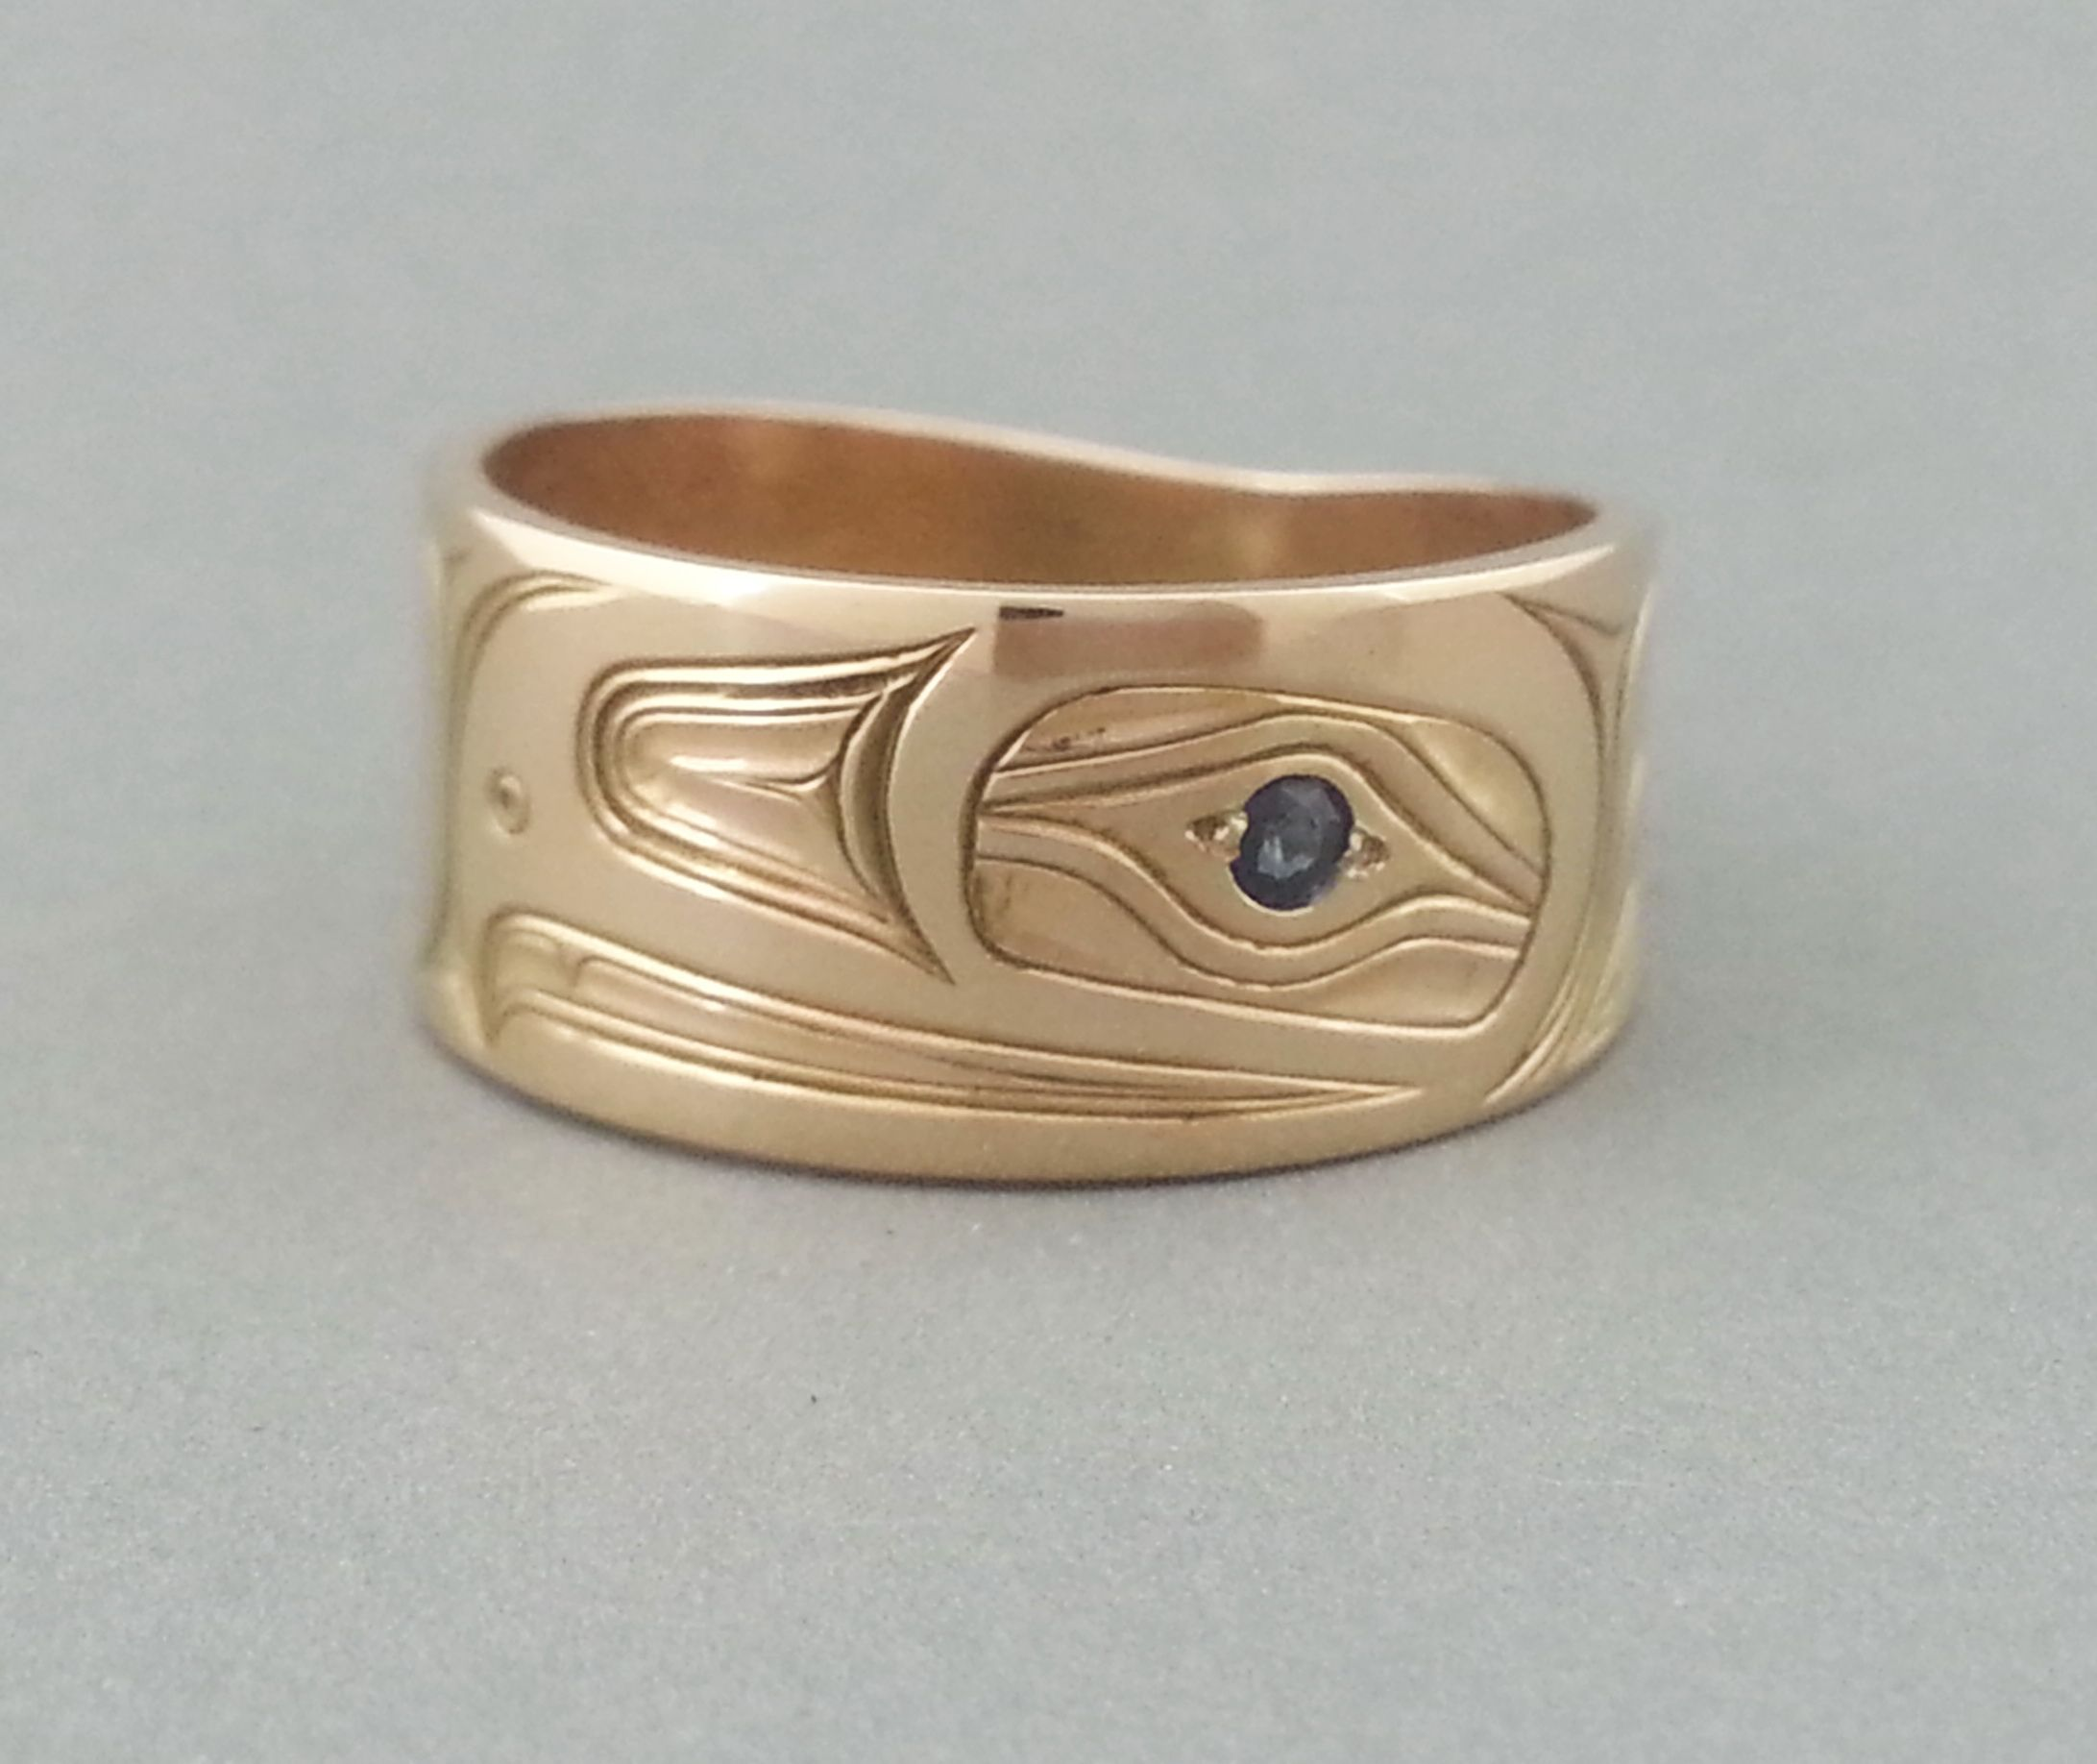 Eagle Ring, 14K gold & sapphire.   #northwestNativeIndianArtJewelry www.davidneel.com